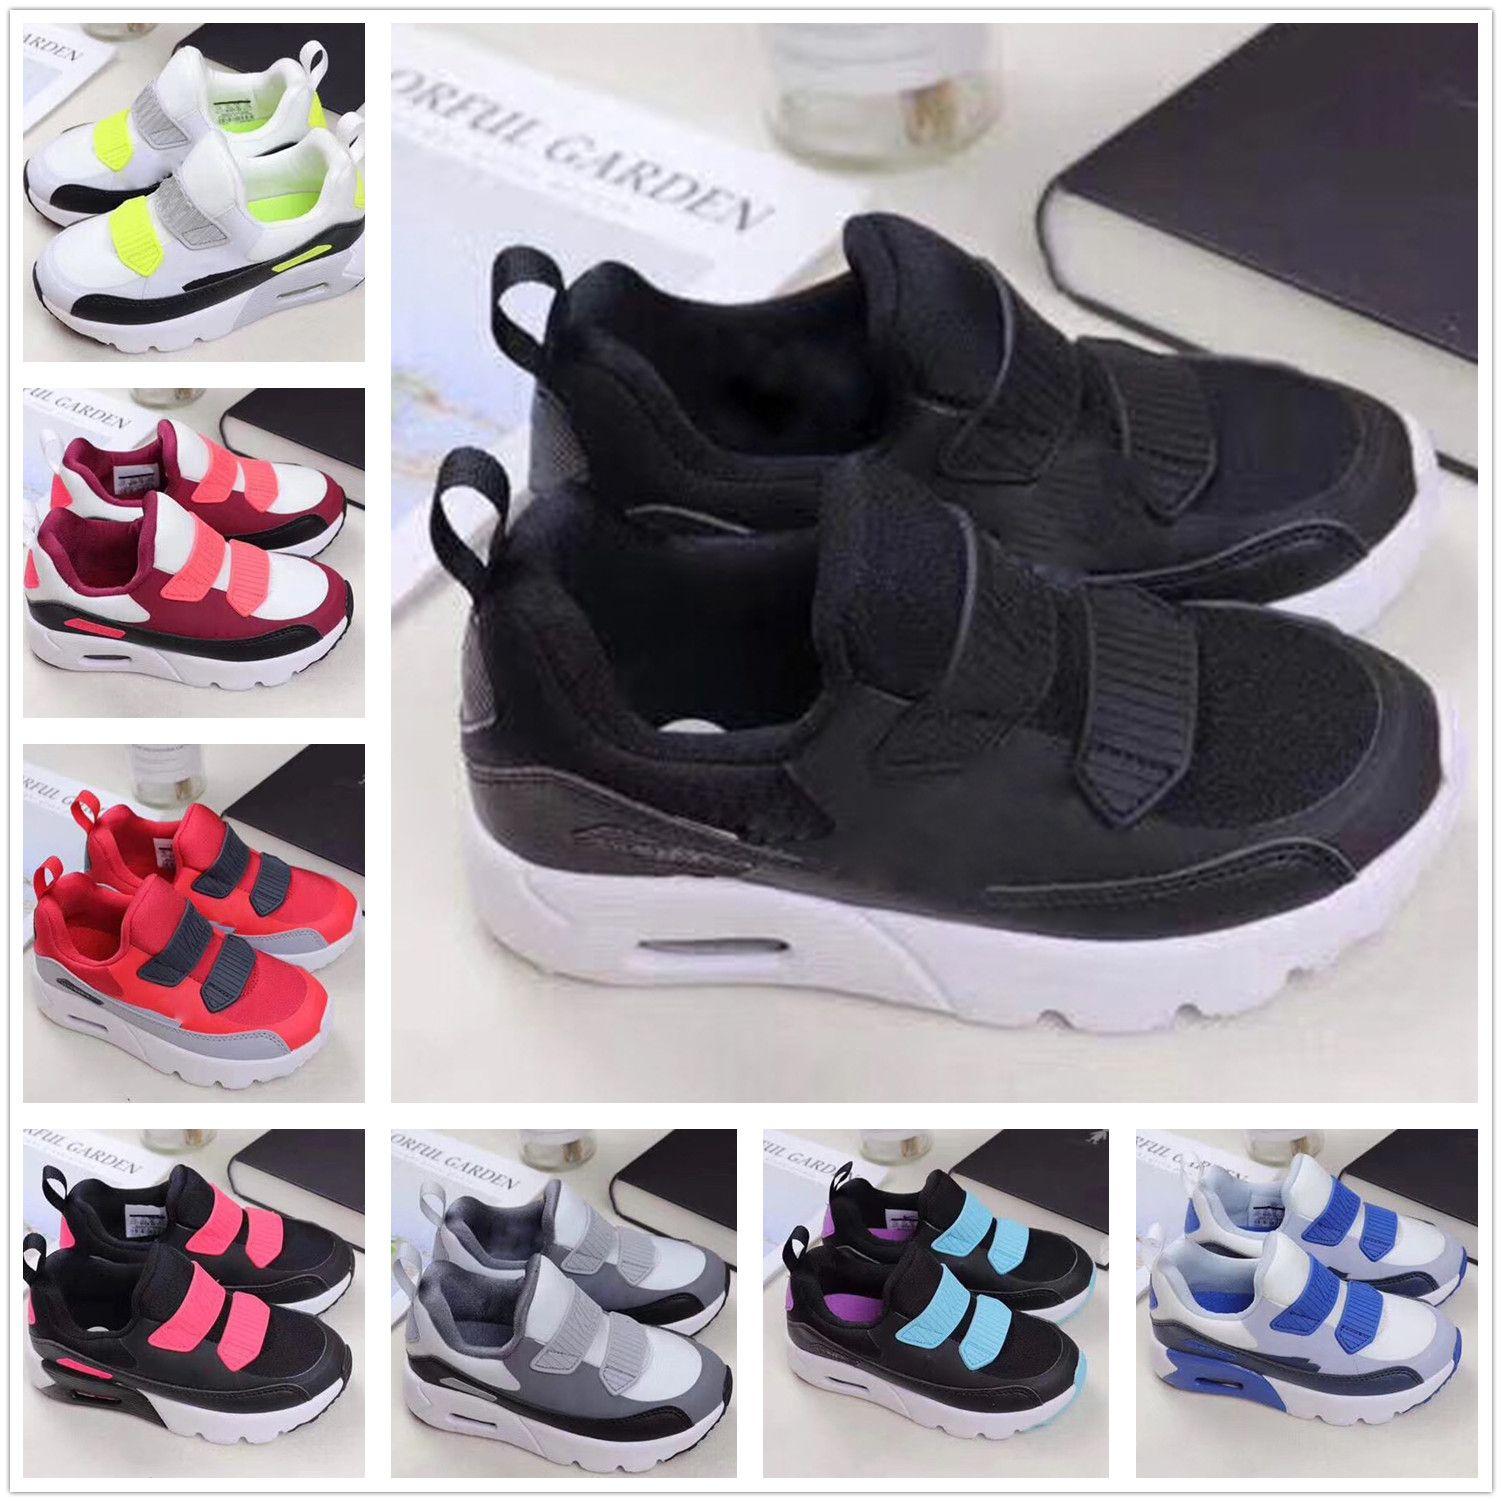 save off 76271 4117a Großhandel Nike Air Max 90 Airmax 90 Designer Neue Marke Kinderschuhe Baby  Kleinkind Dampf Classic 90 Kinder Junge Und Gril Sport Sneaker Basketball  Schuhe ...